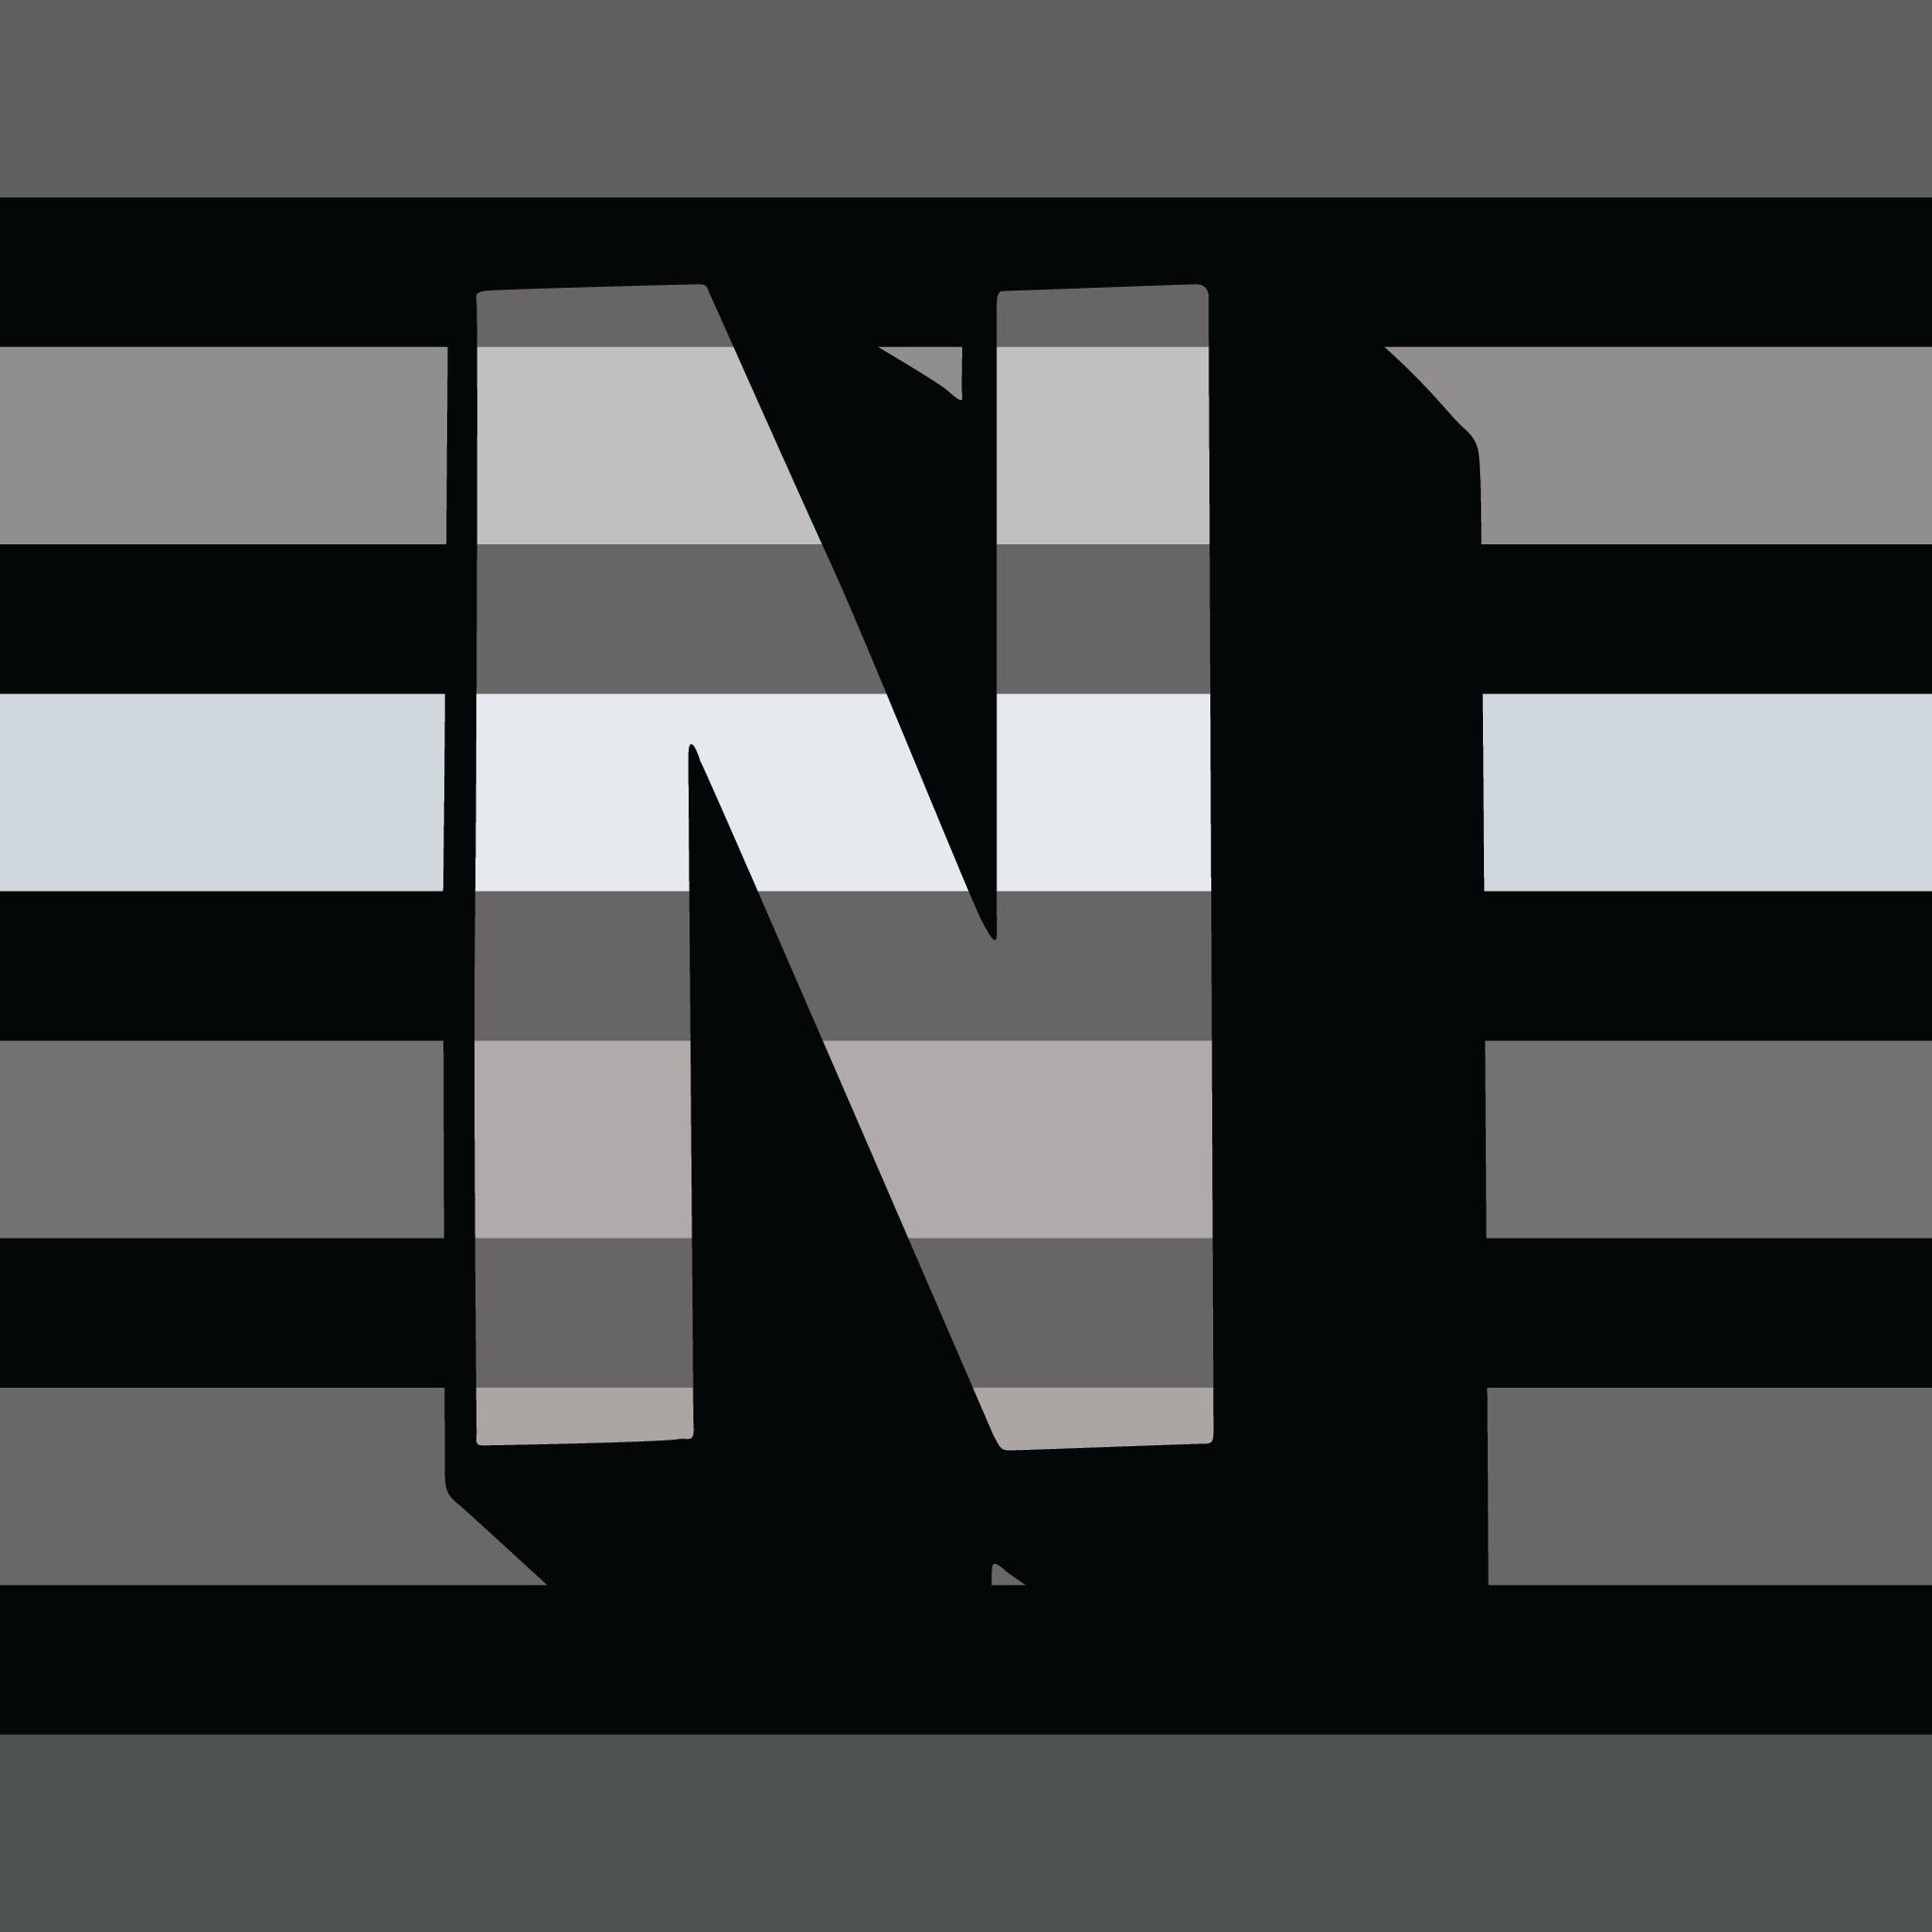 Nick Haldon's logo